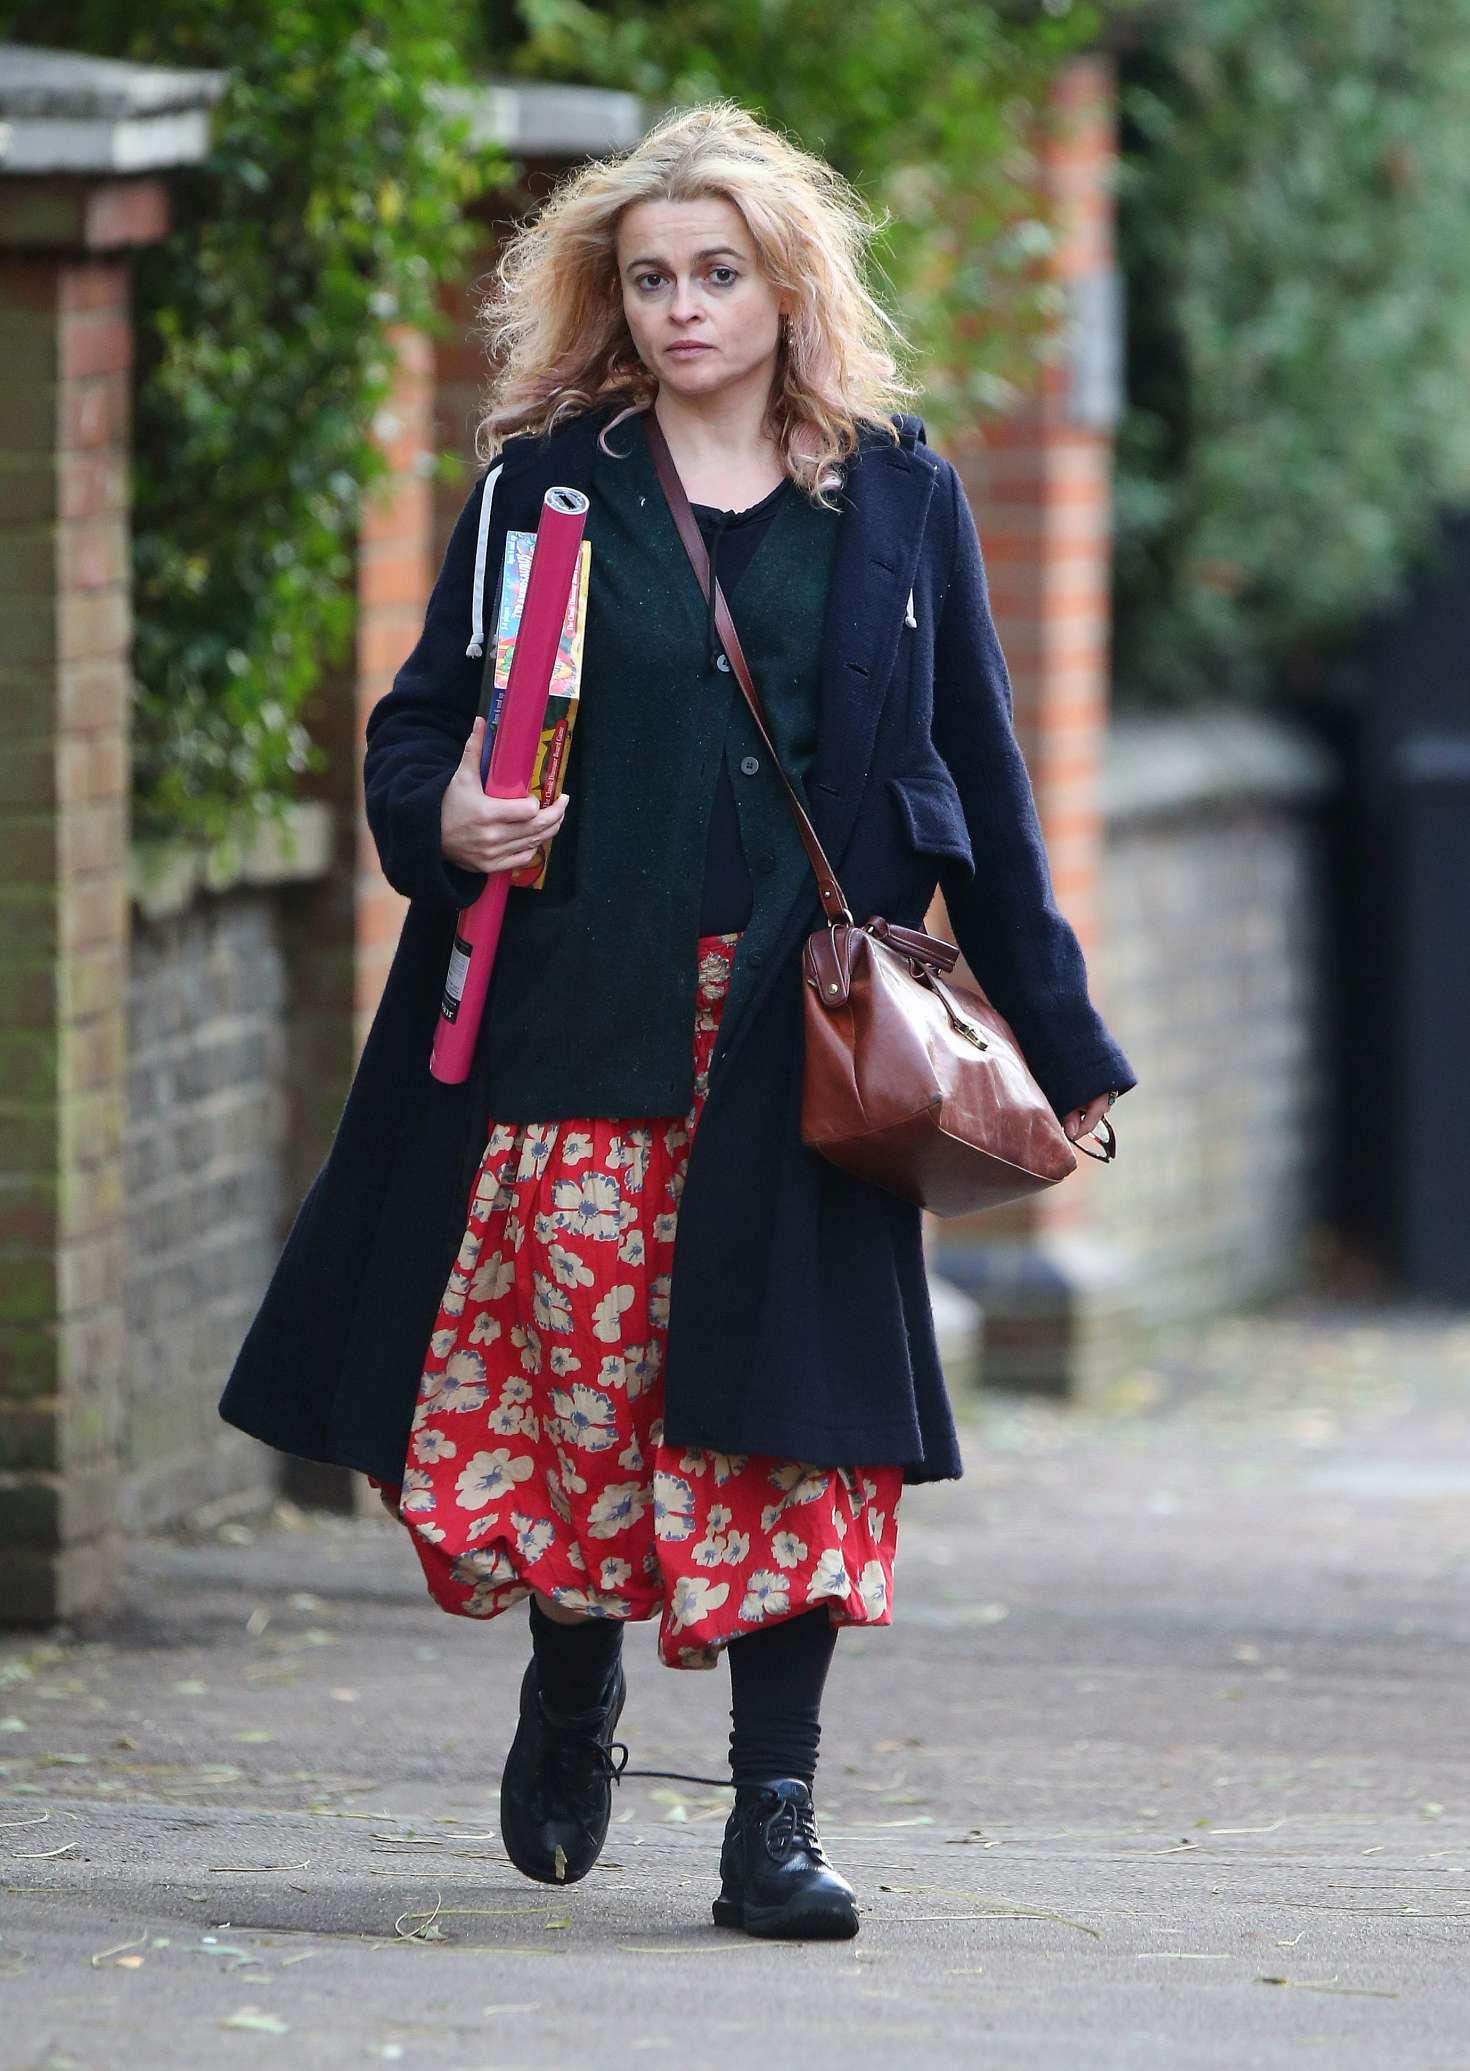 Helena Bonham Carter 2016 : Helena Bonham Carter: Christmas Shopping in London -04